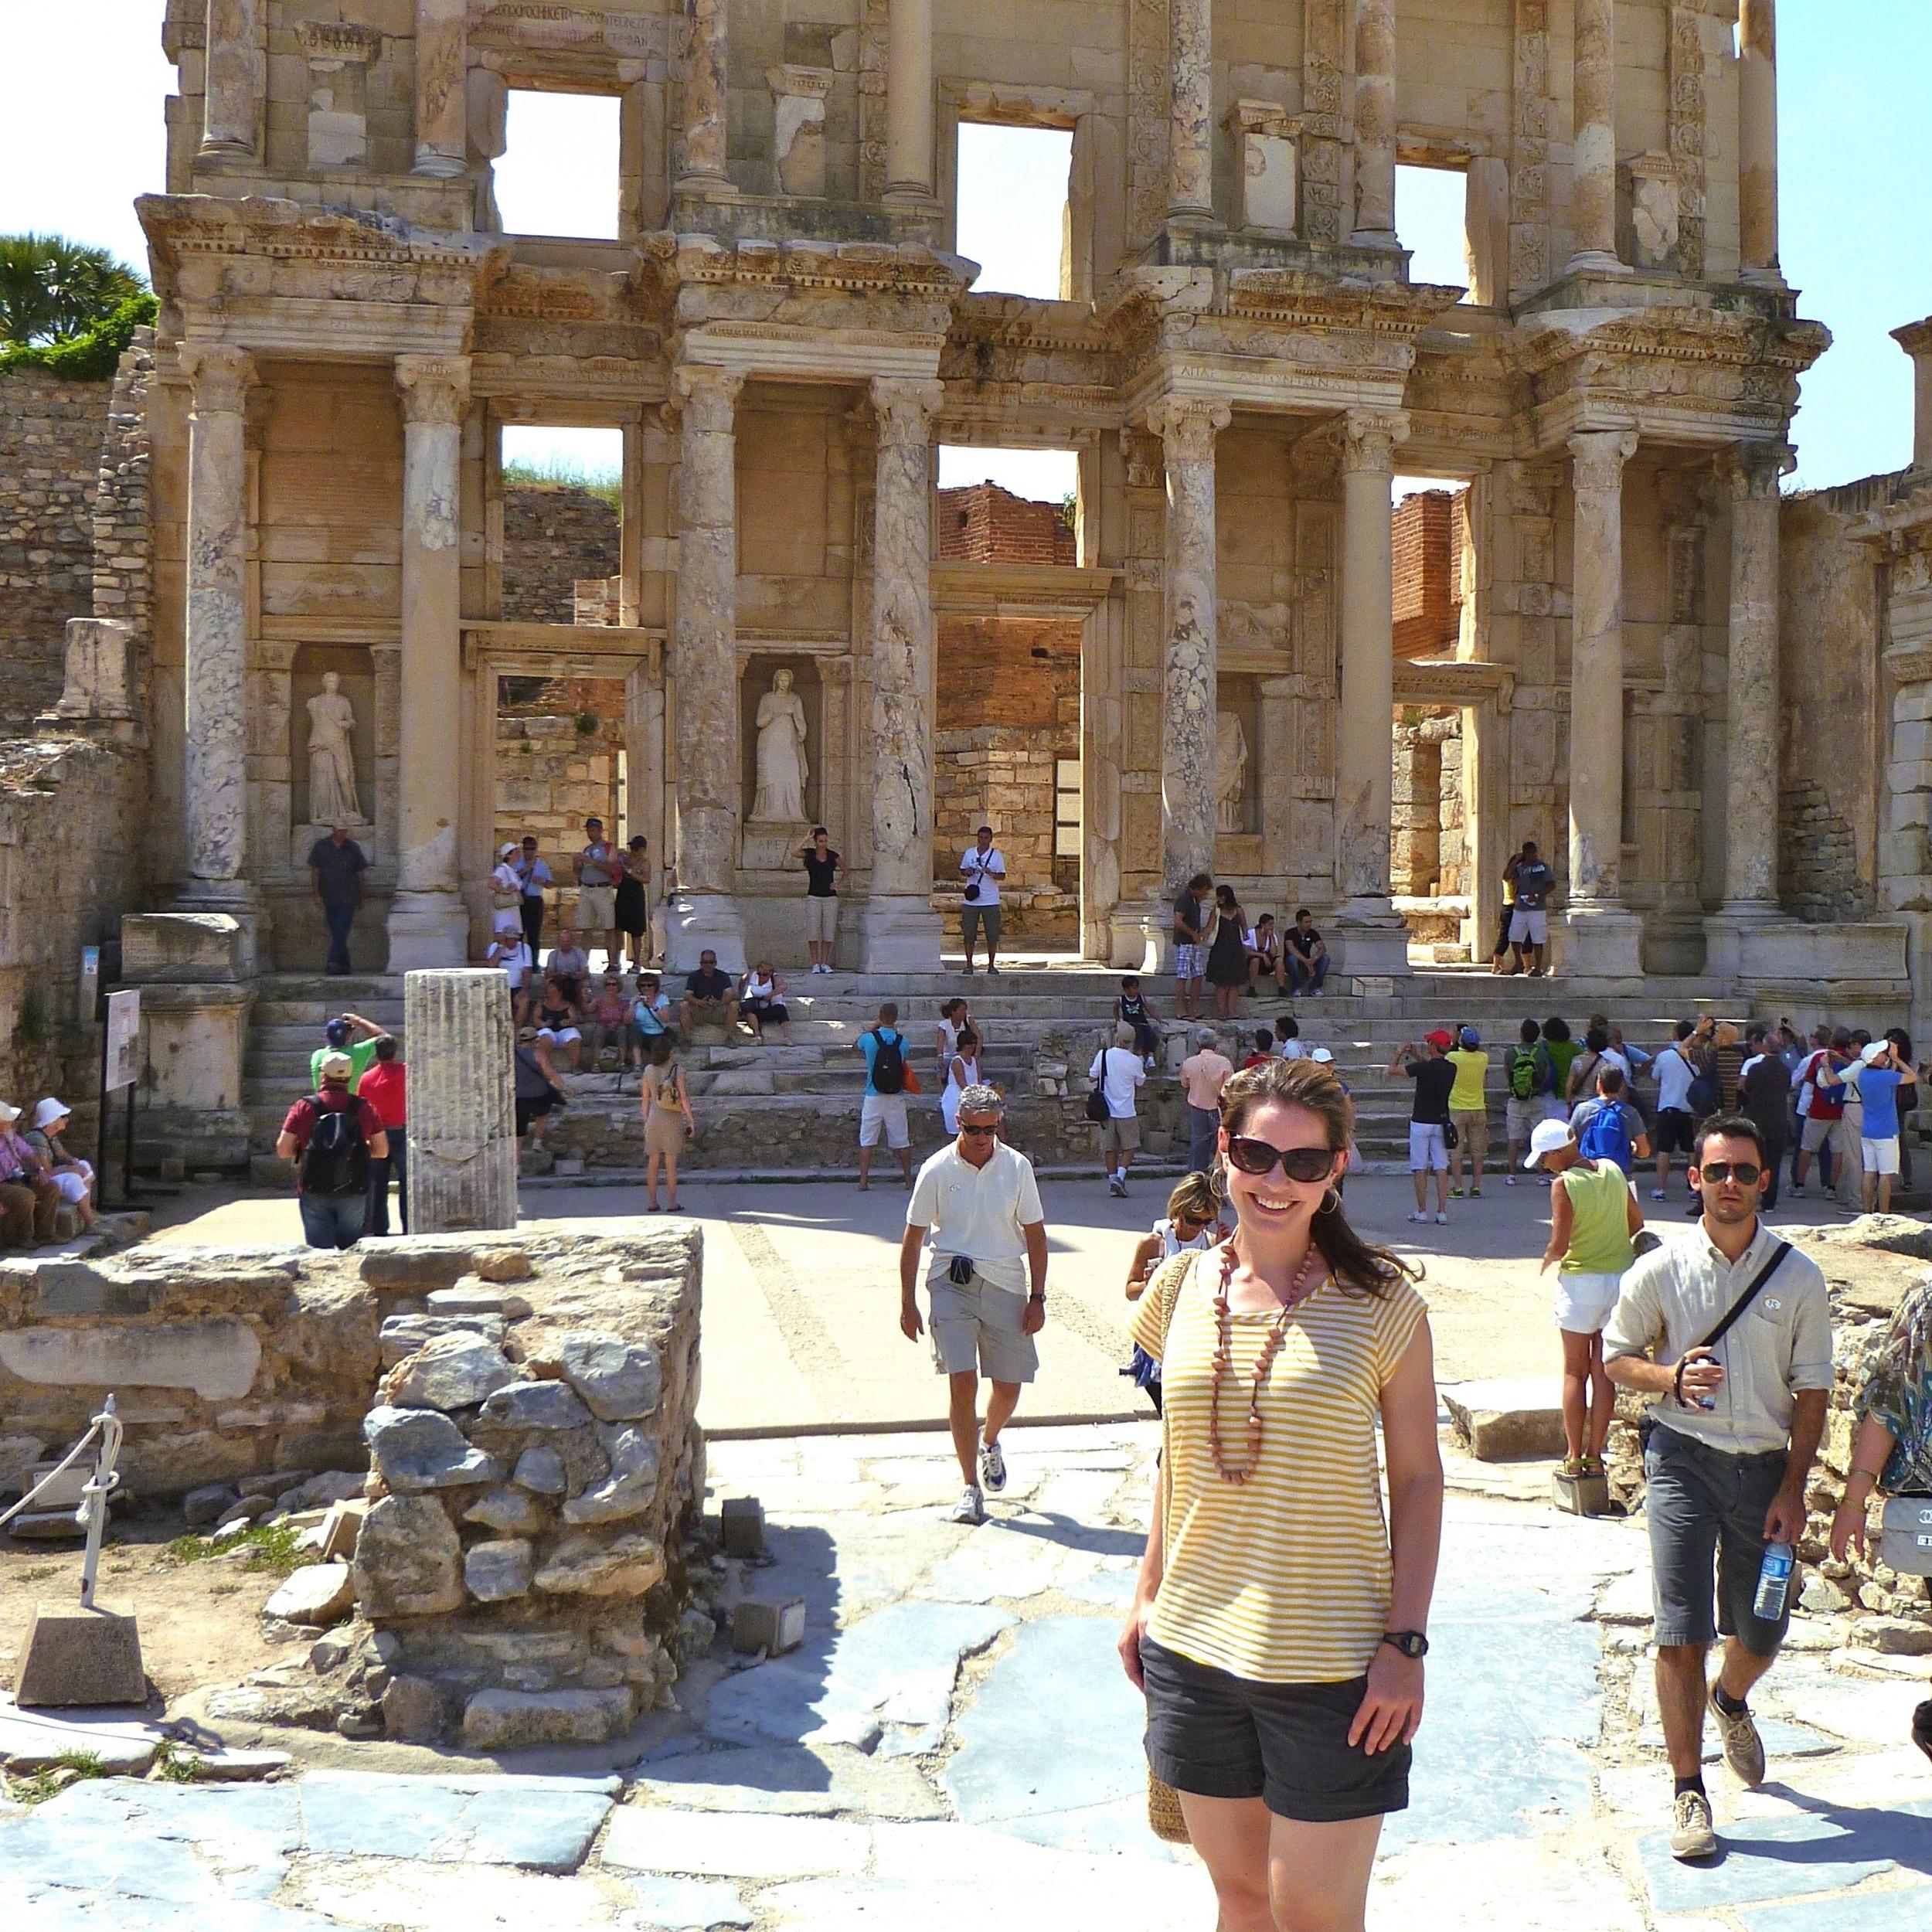 The Library of Celsus (Ephesus, Turkey)